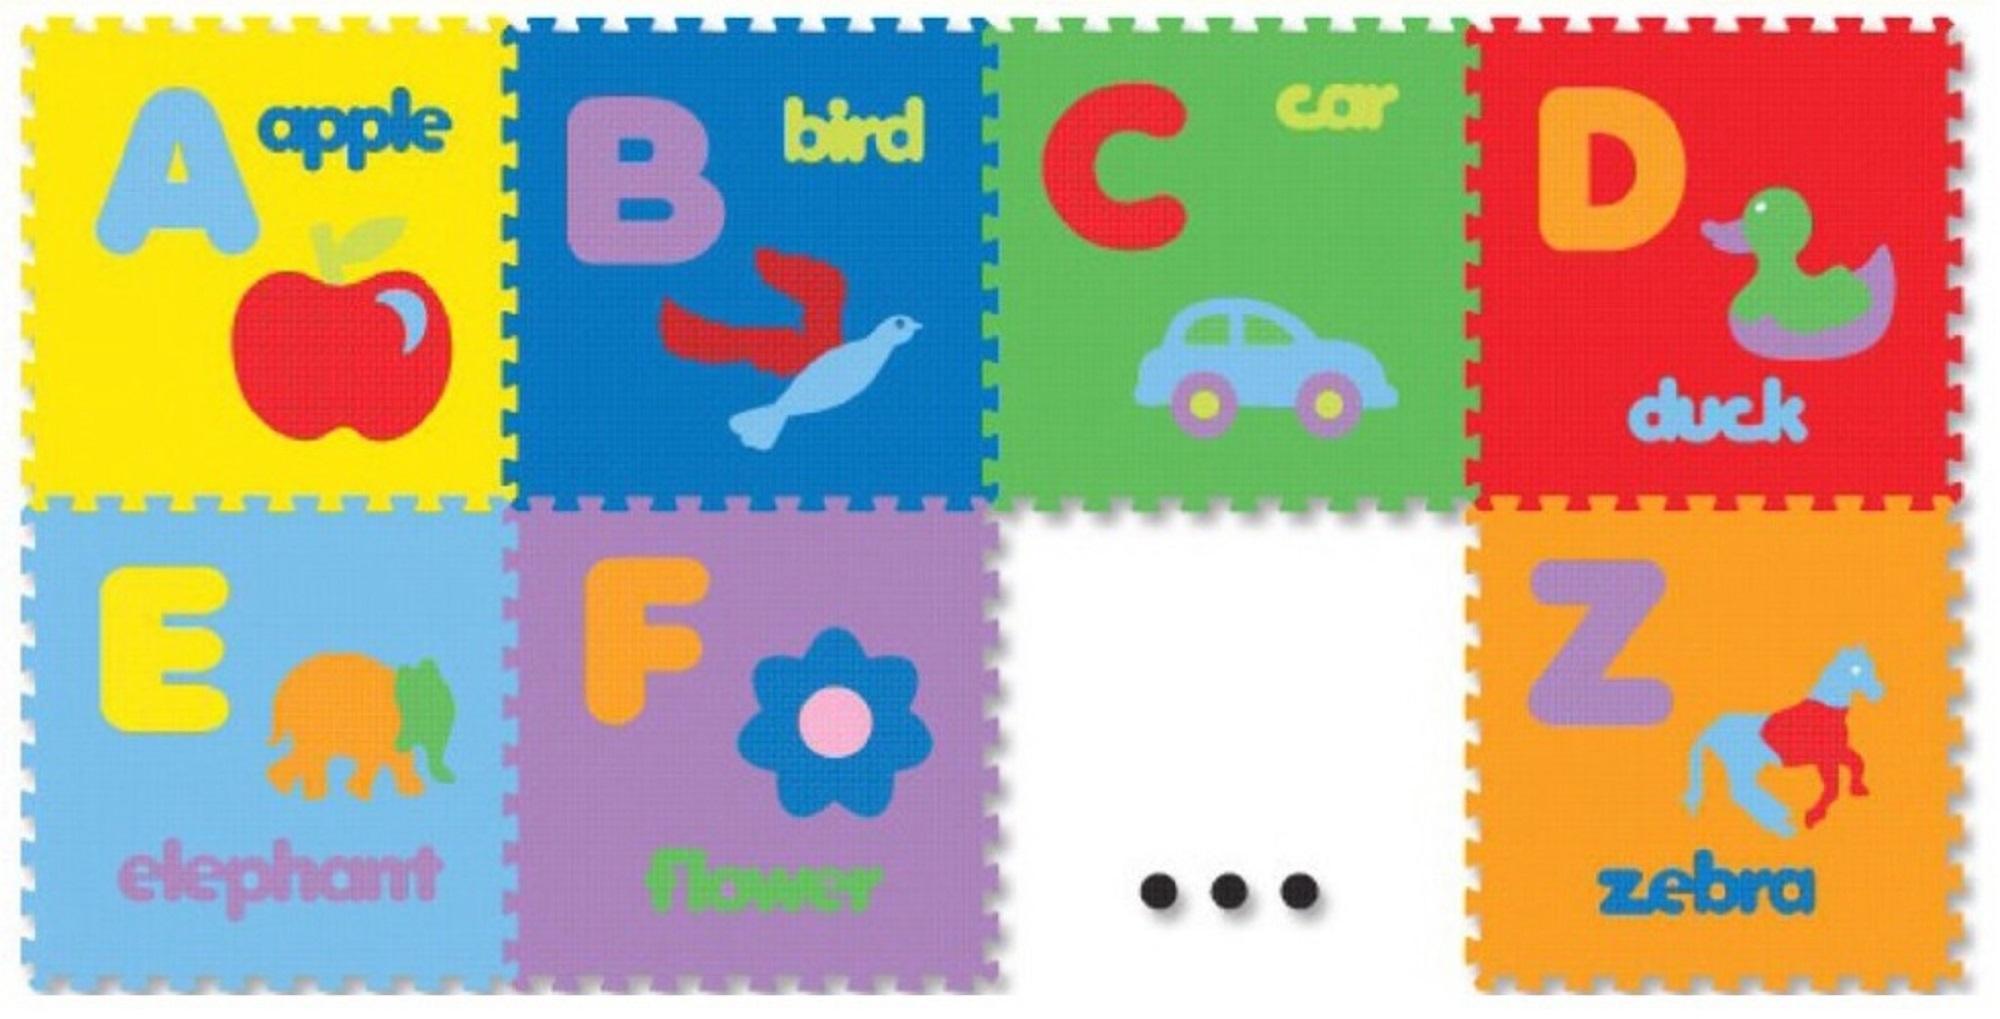 Jual Karpet Puzzle Evamat Terbaru Tikar Duduk Evamate 120cm X 200cm Alas Lantai Modern Matras Bermain Anak Alphabet Abjad Gambar